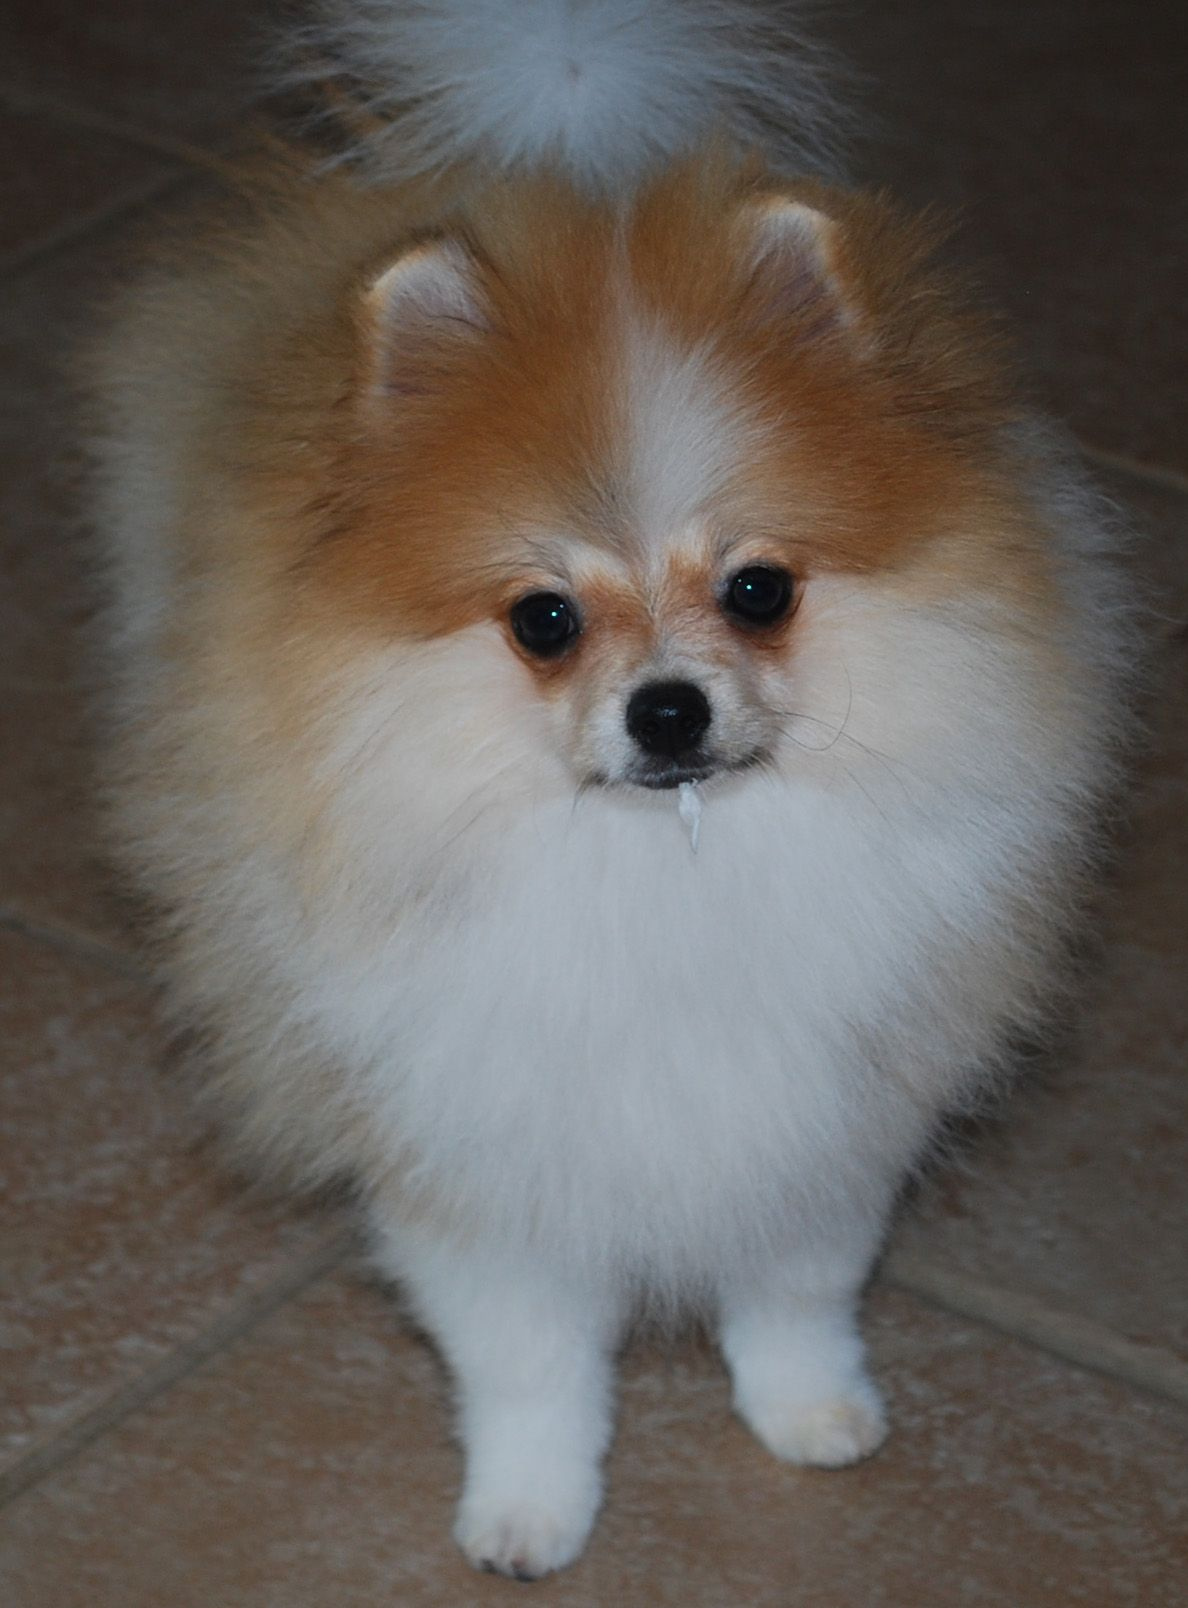 Pomeranian Puppy Uglies & Color Changes Pomeranian puppy